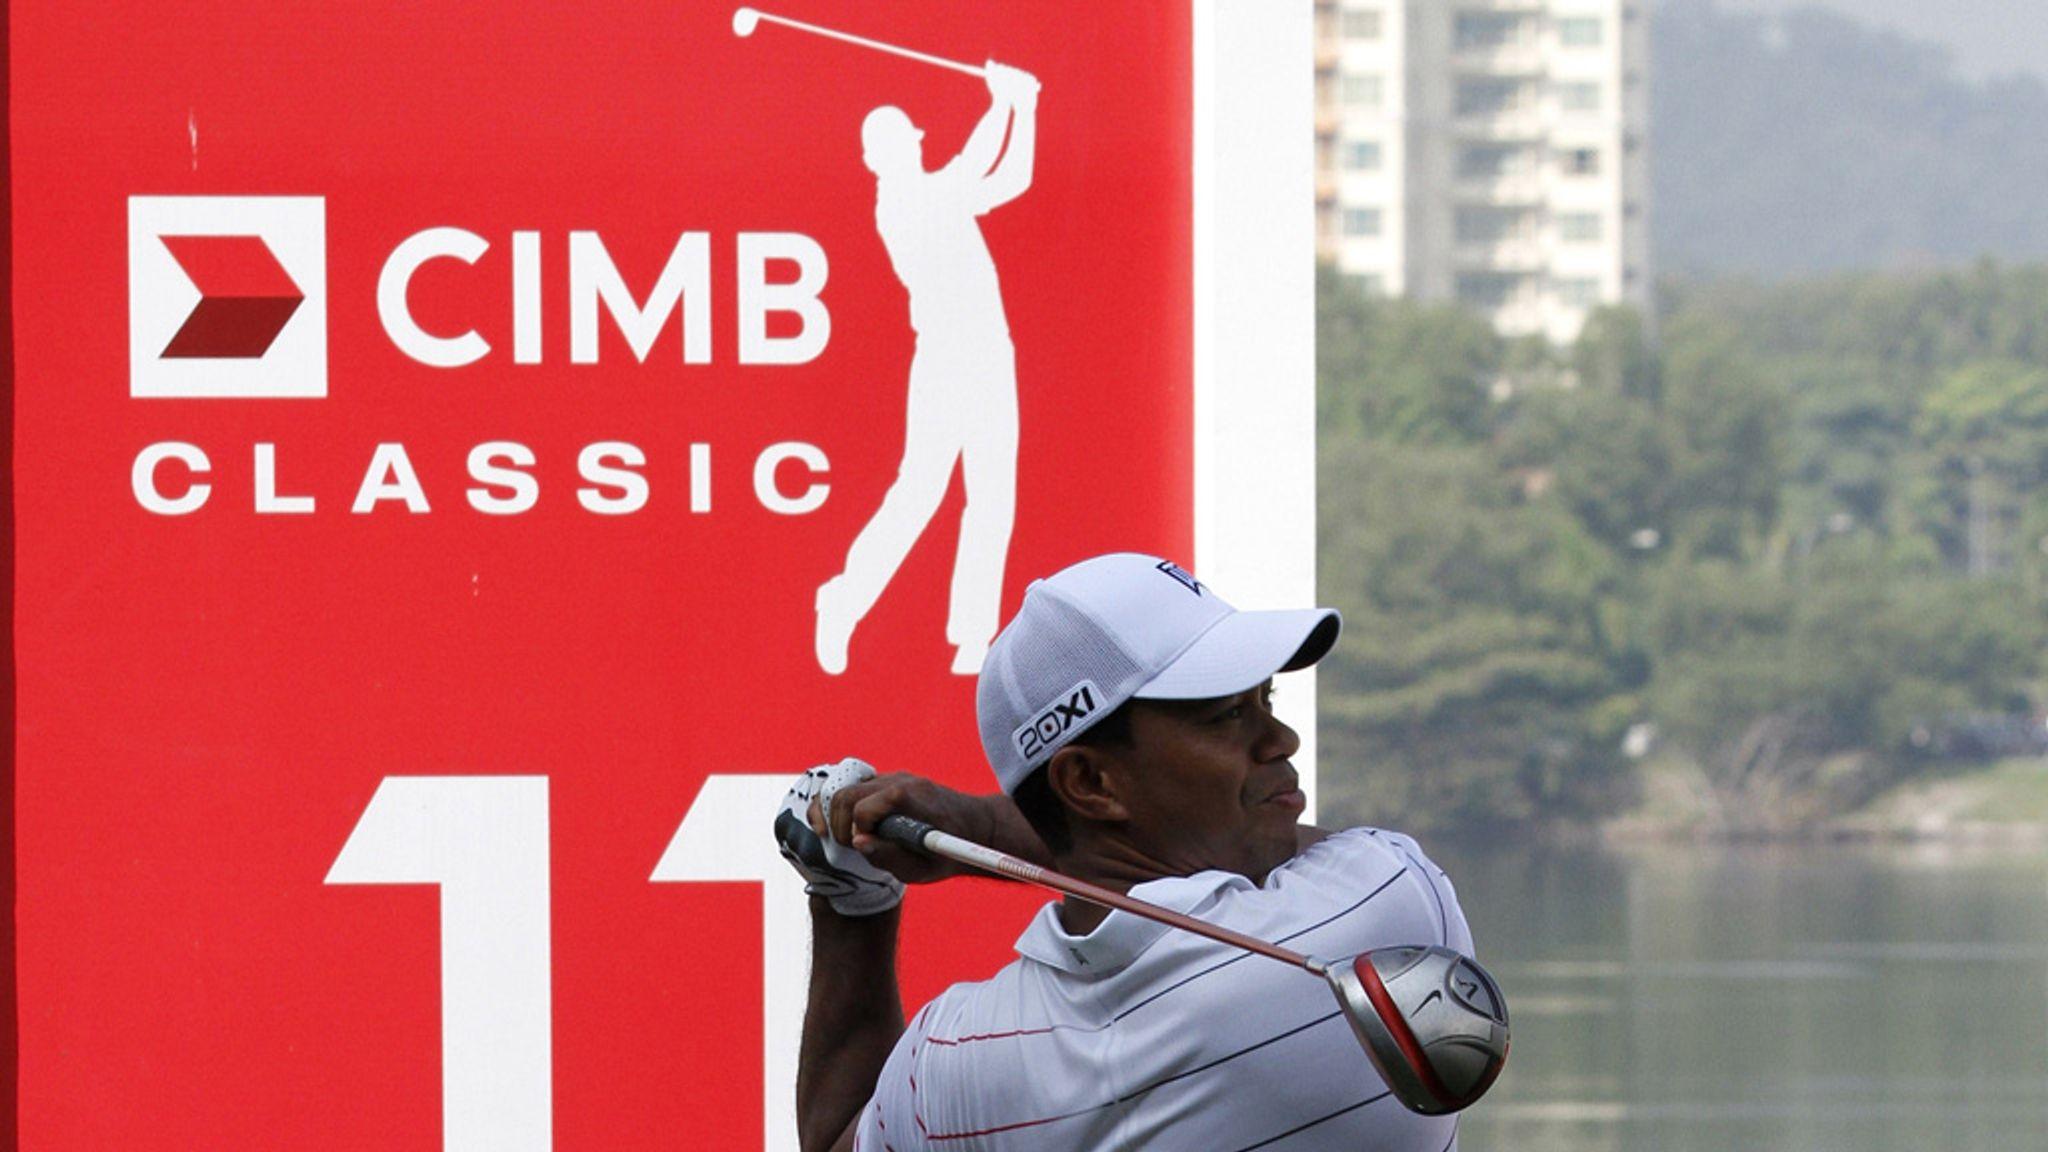 Cimb golf betting is binary options trading harambee